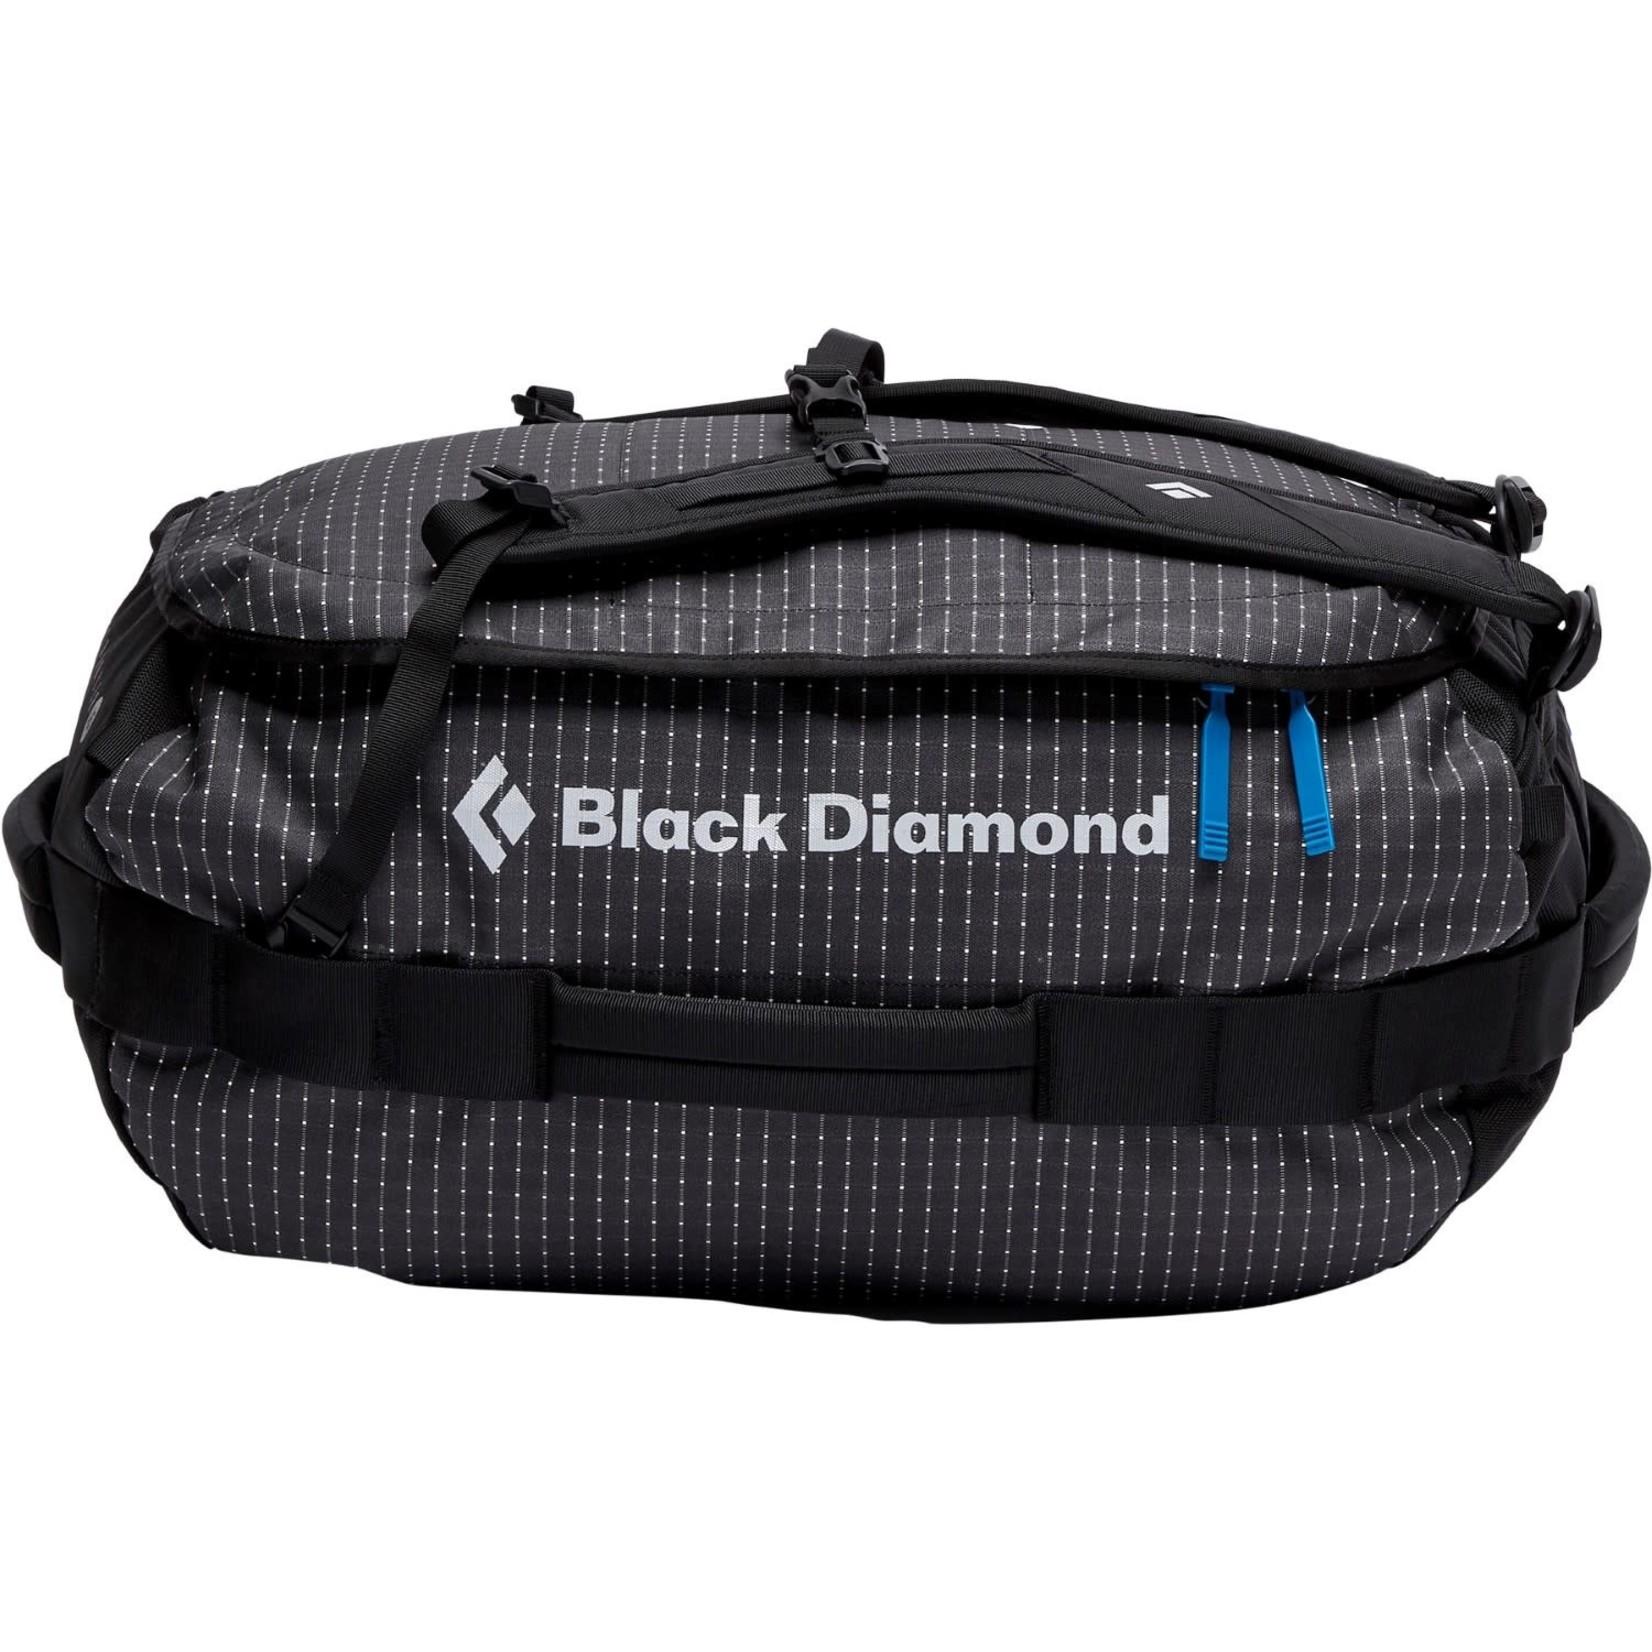 Black Diamond Sac fourre-tout Black Diamond Stonehauler 45 L